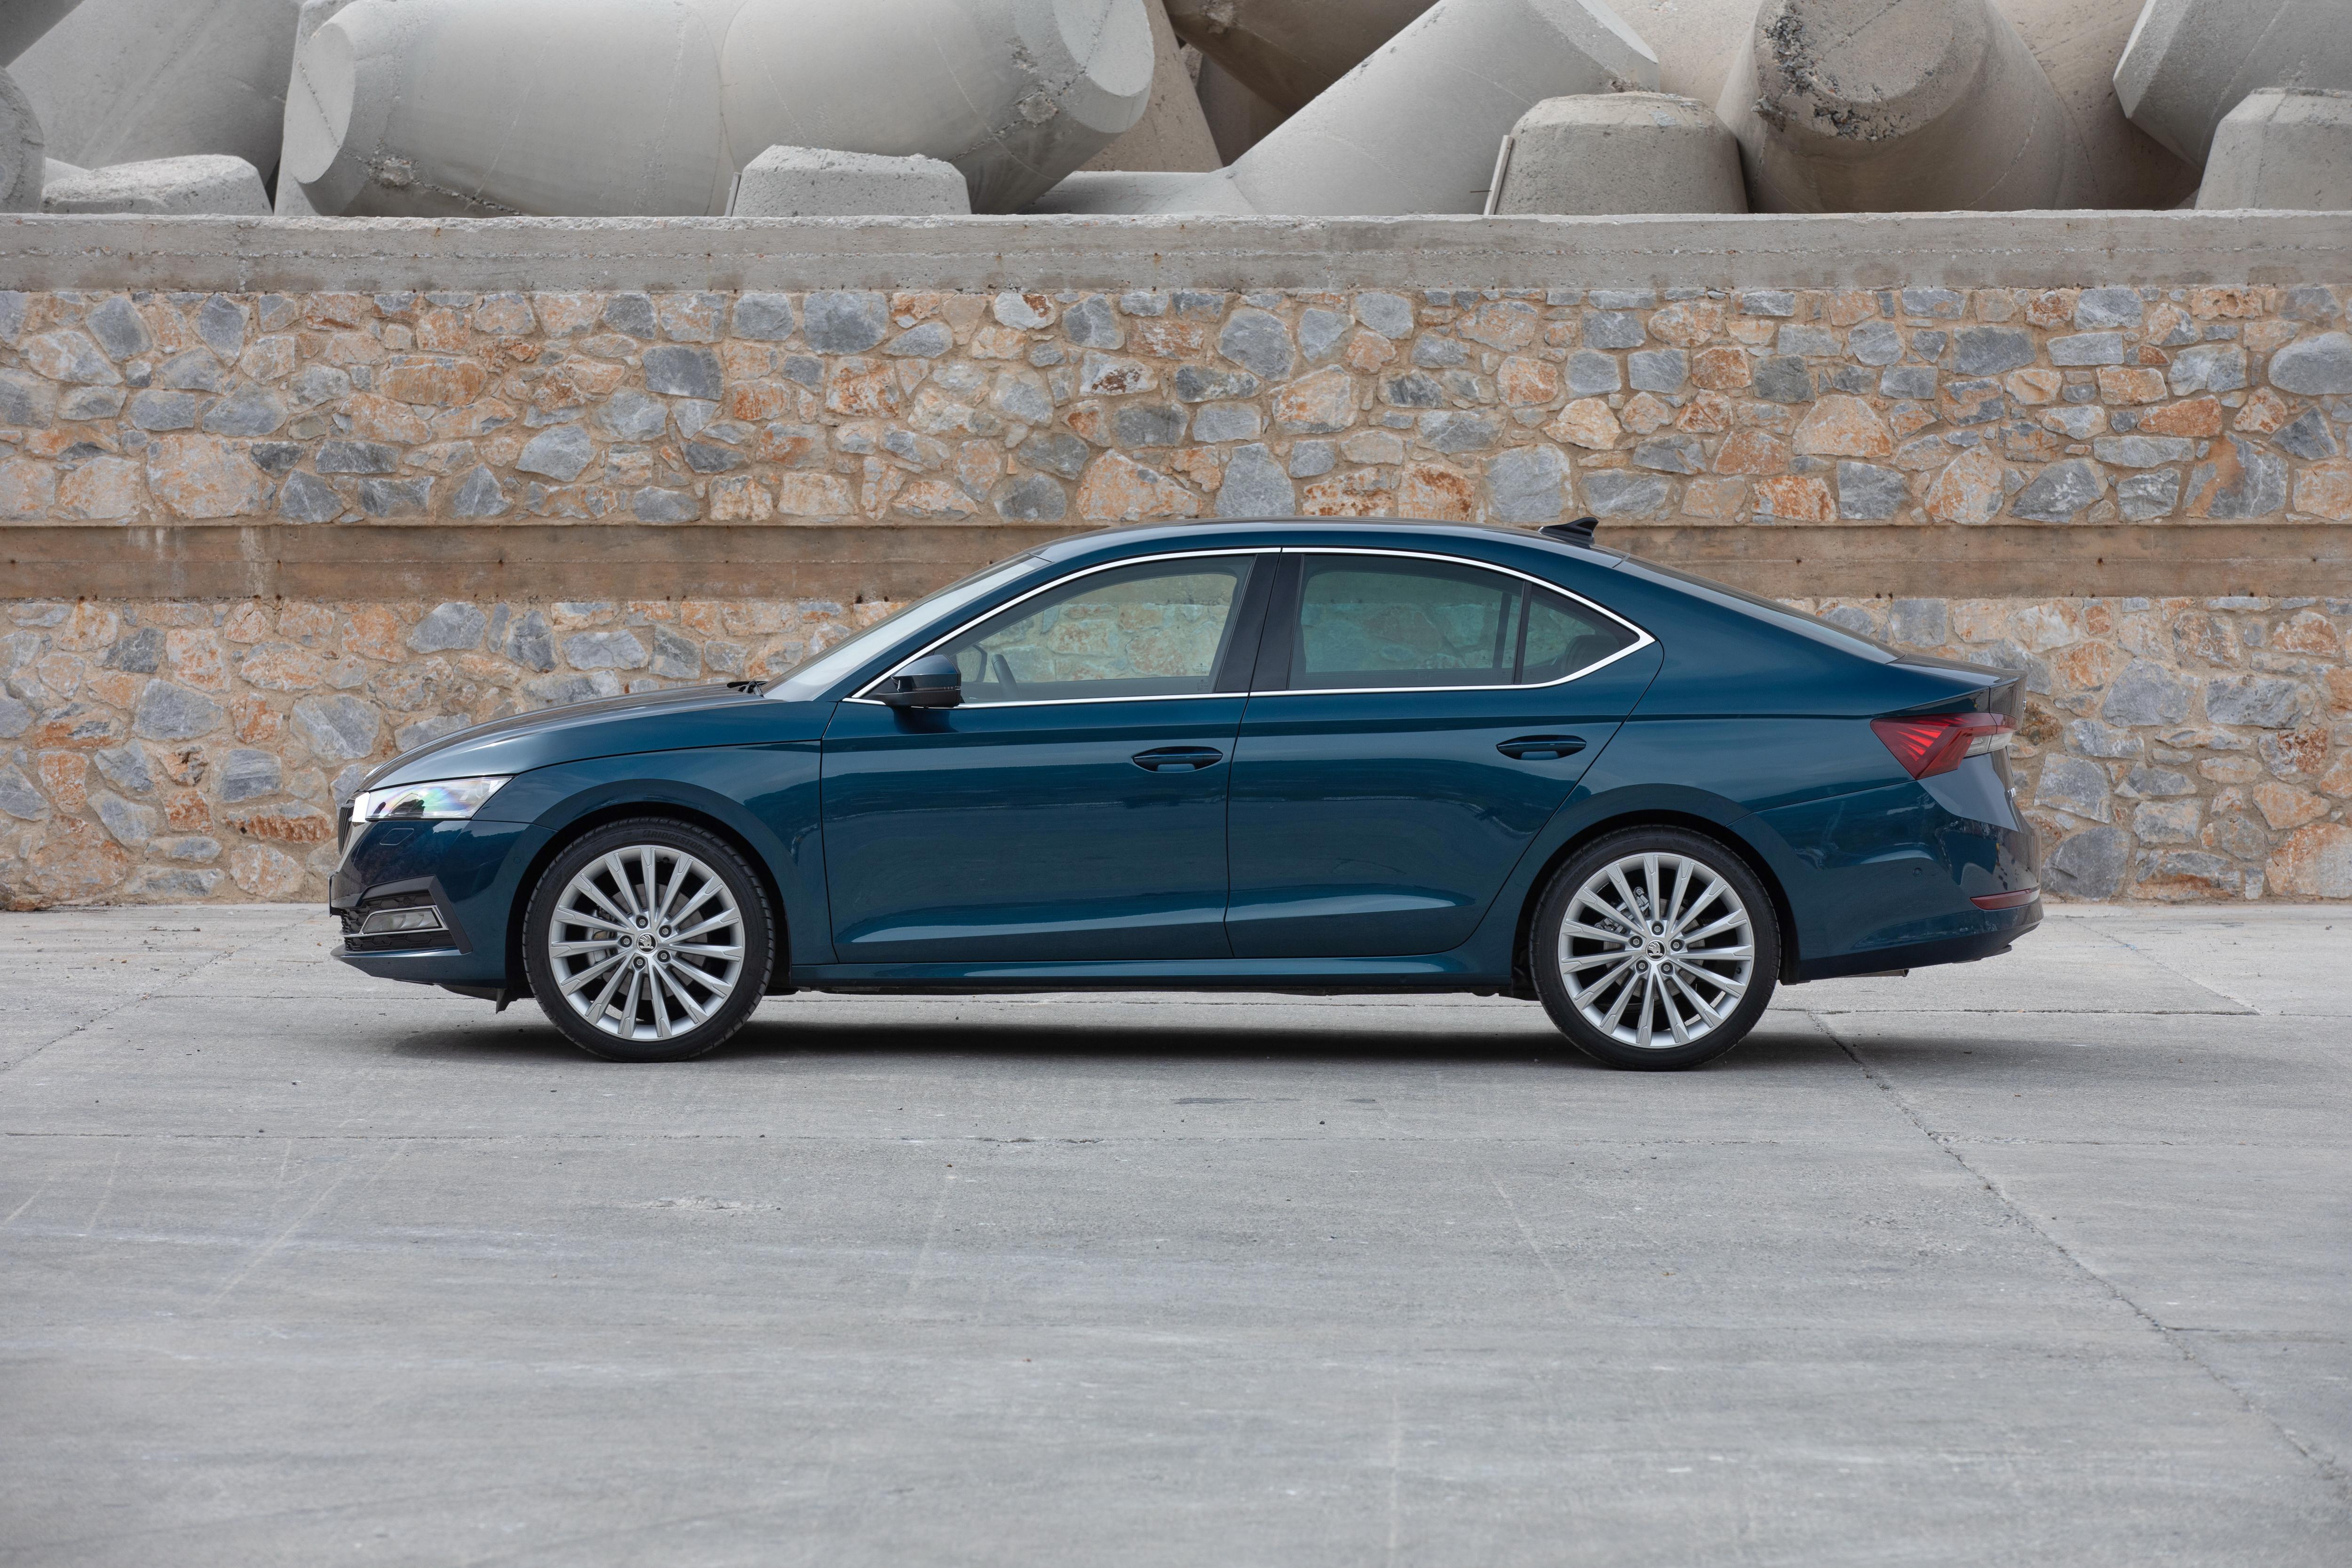 The all-new SKODA OCTAVIA: spacious, practical and elegant like a coupé - Image 3